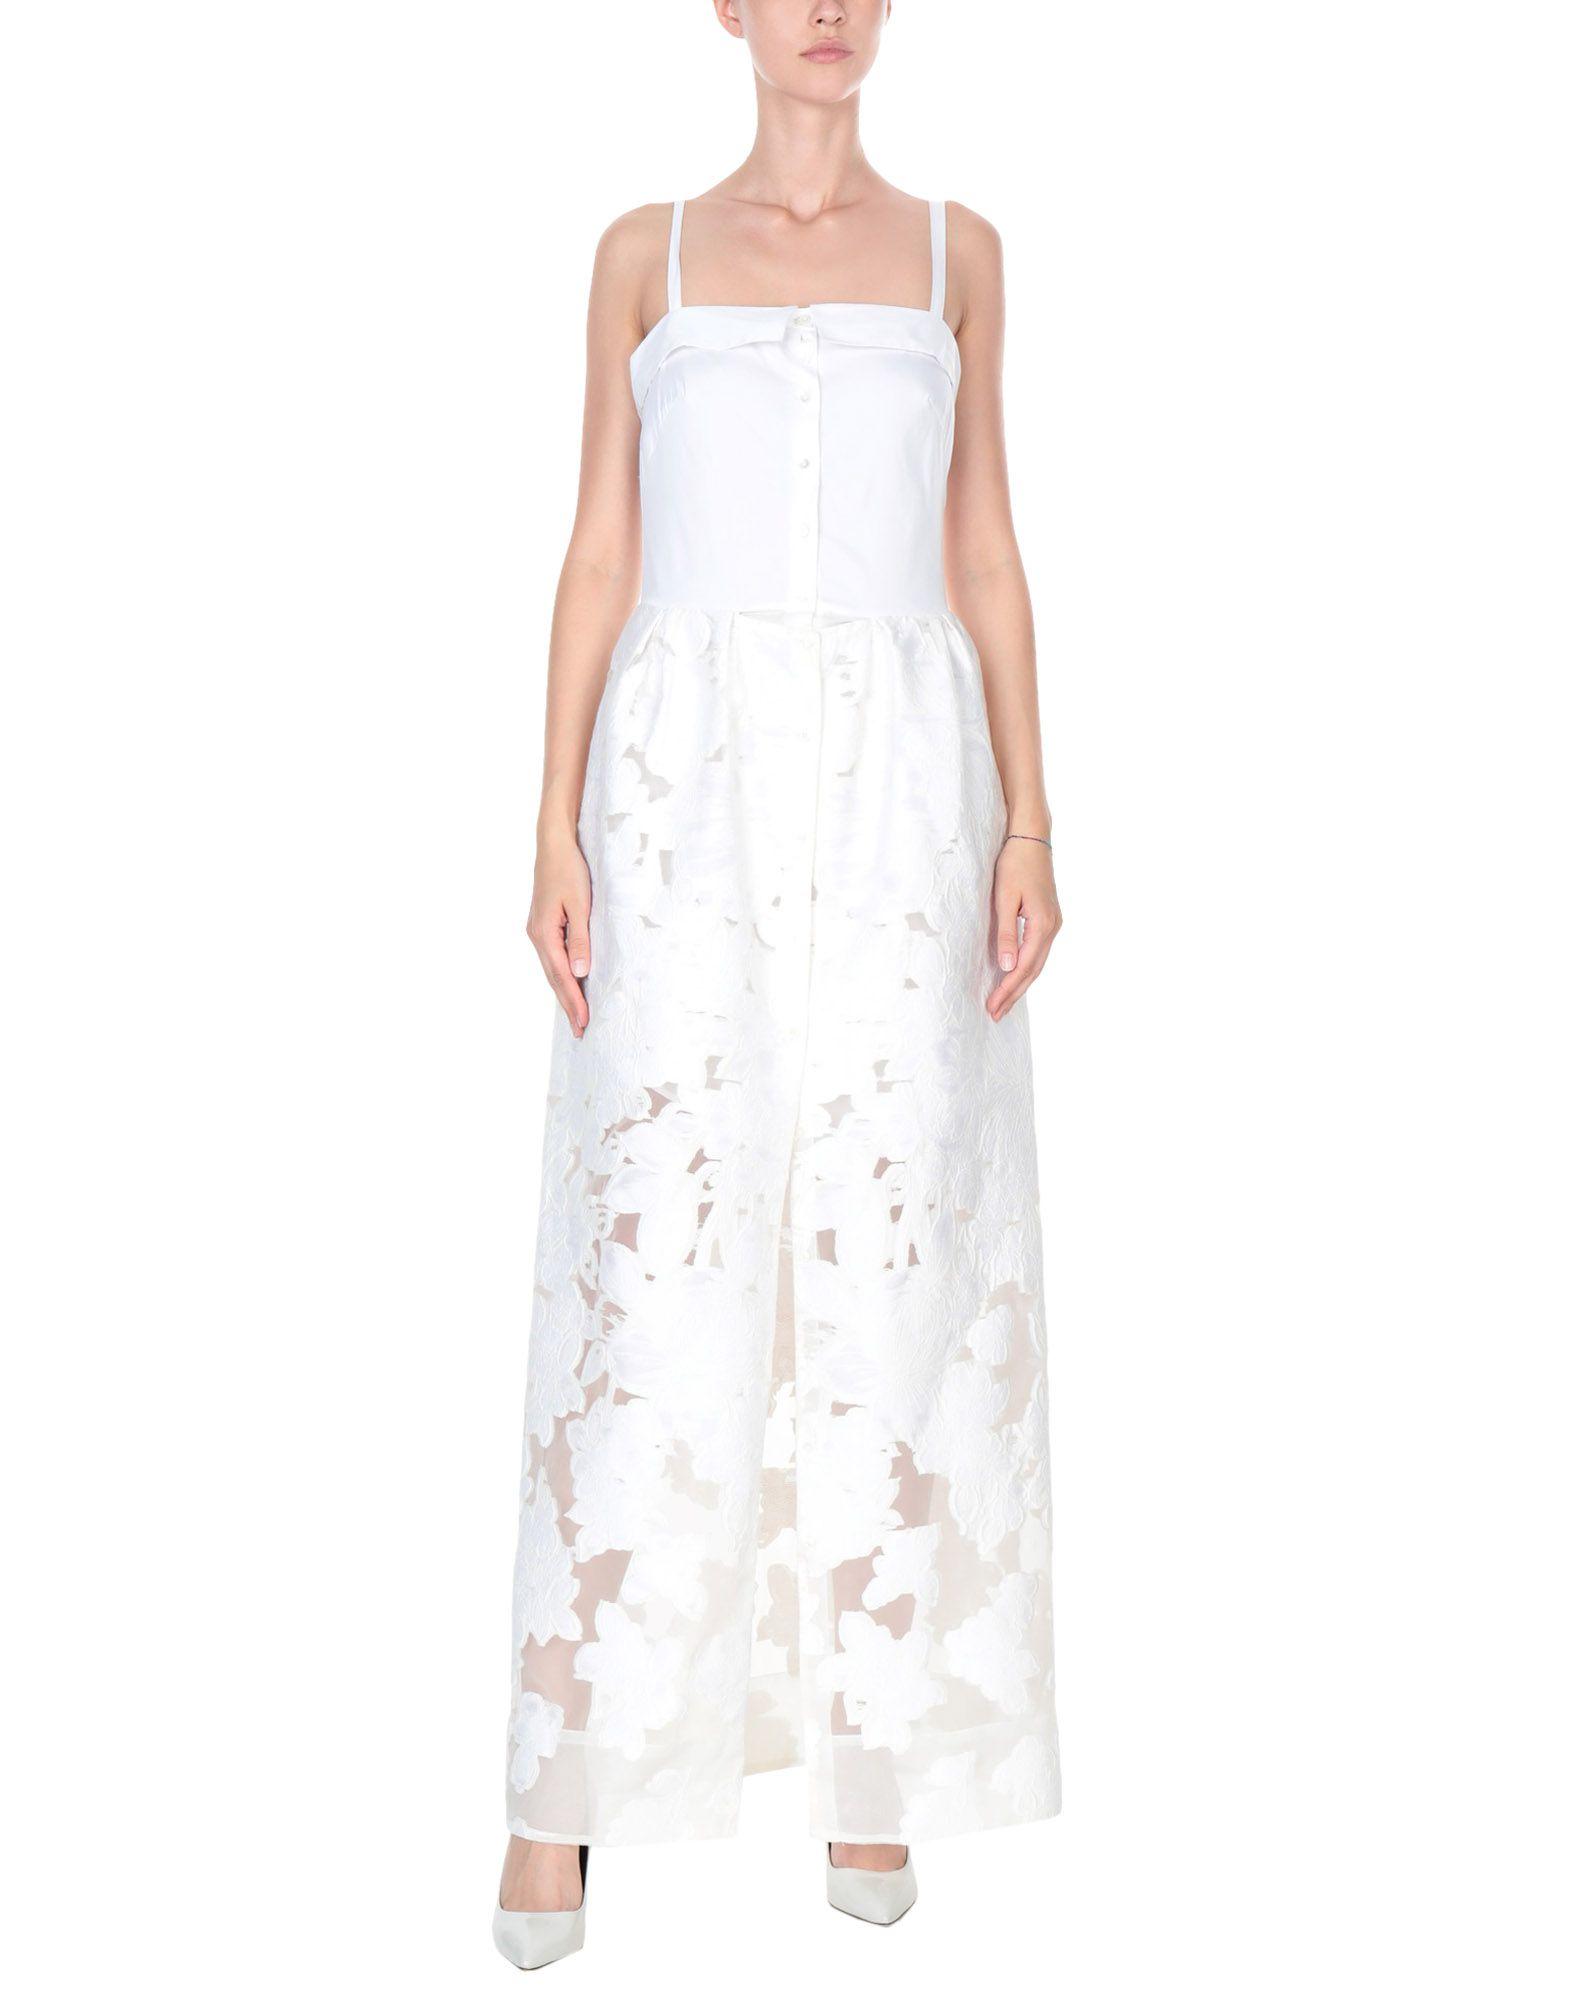 SARA ROKA Длинное платье платье рубашка fox yulia sway платье рубашка fox